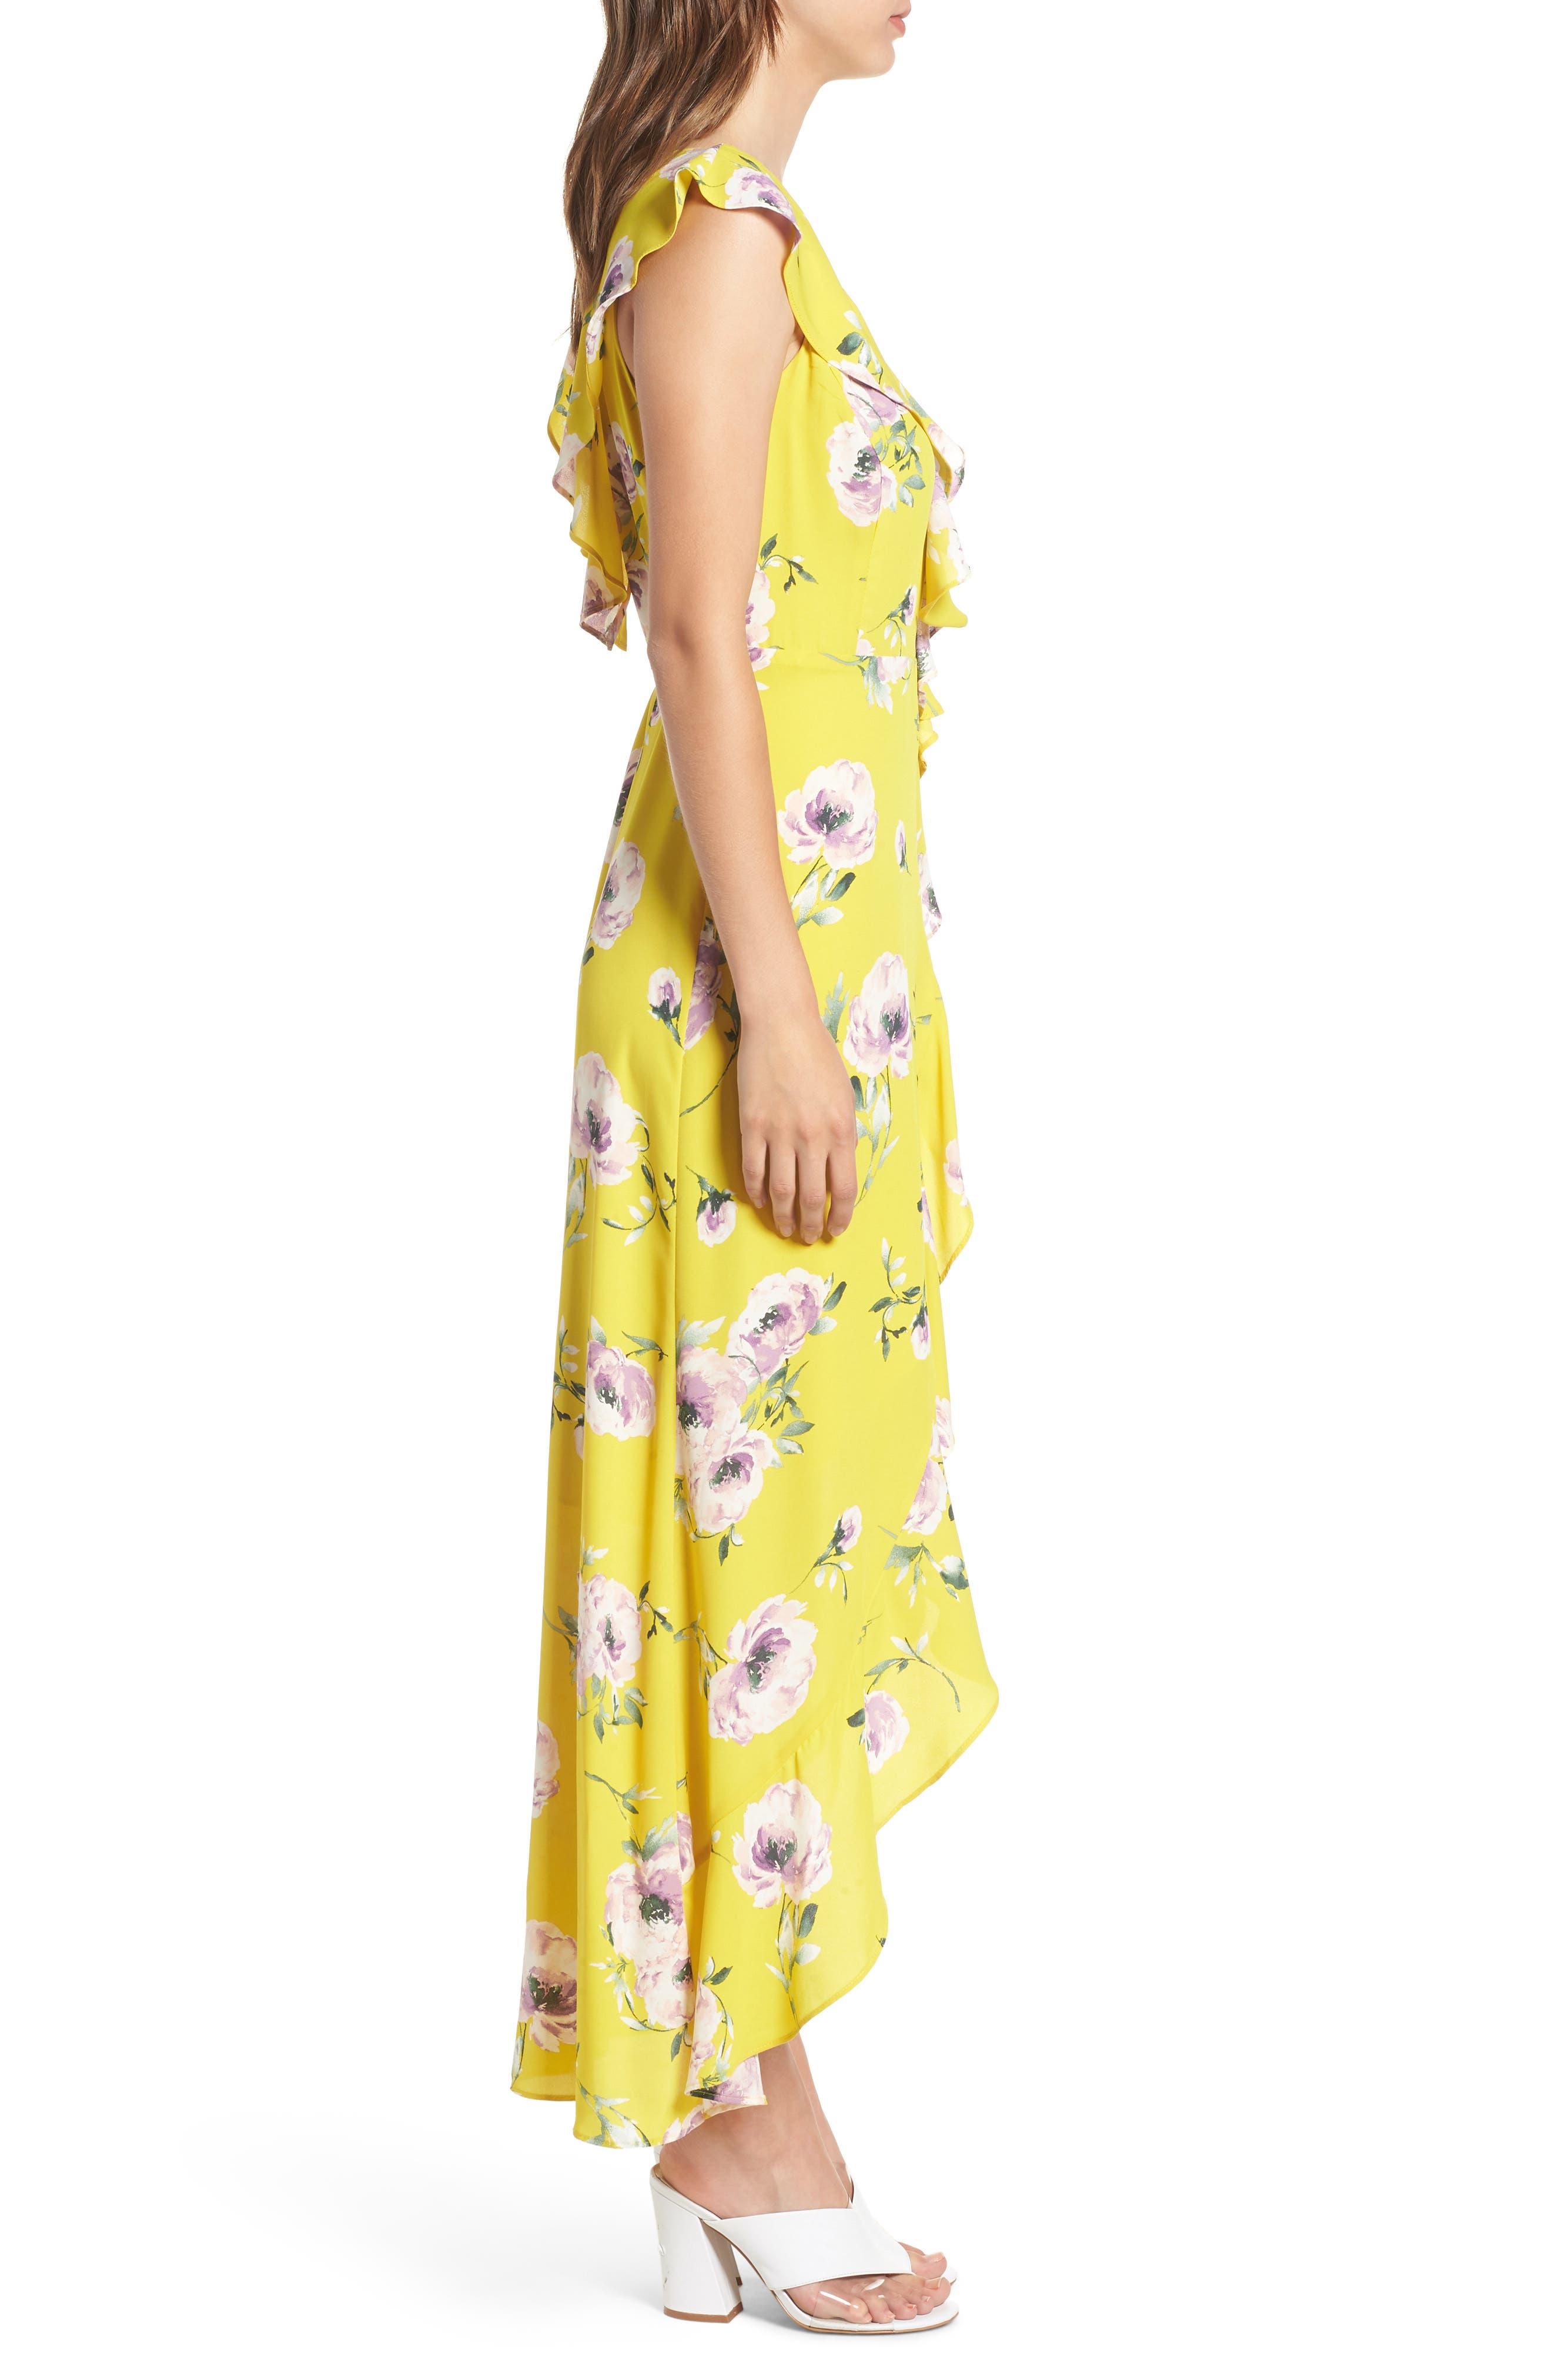 Ruffle Wrap Maxi Dress,                             Alternate thumbnail 3, color,                             YELLOW TEA BLOOM FLORAL